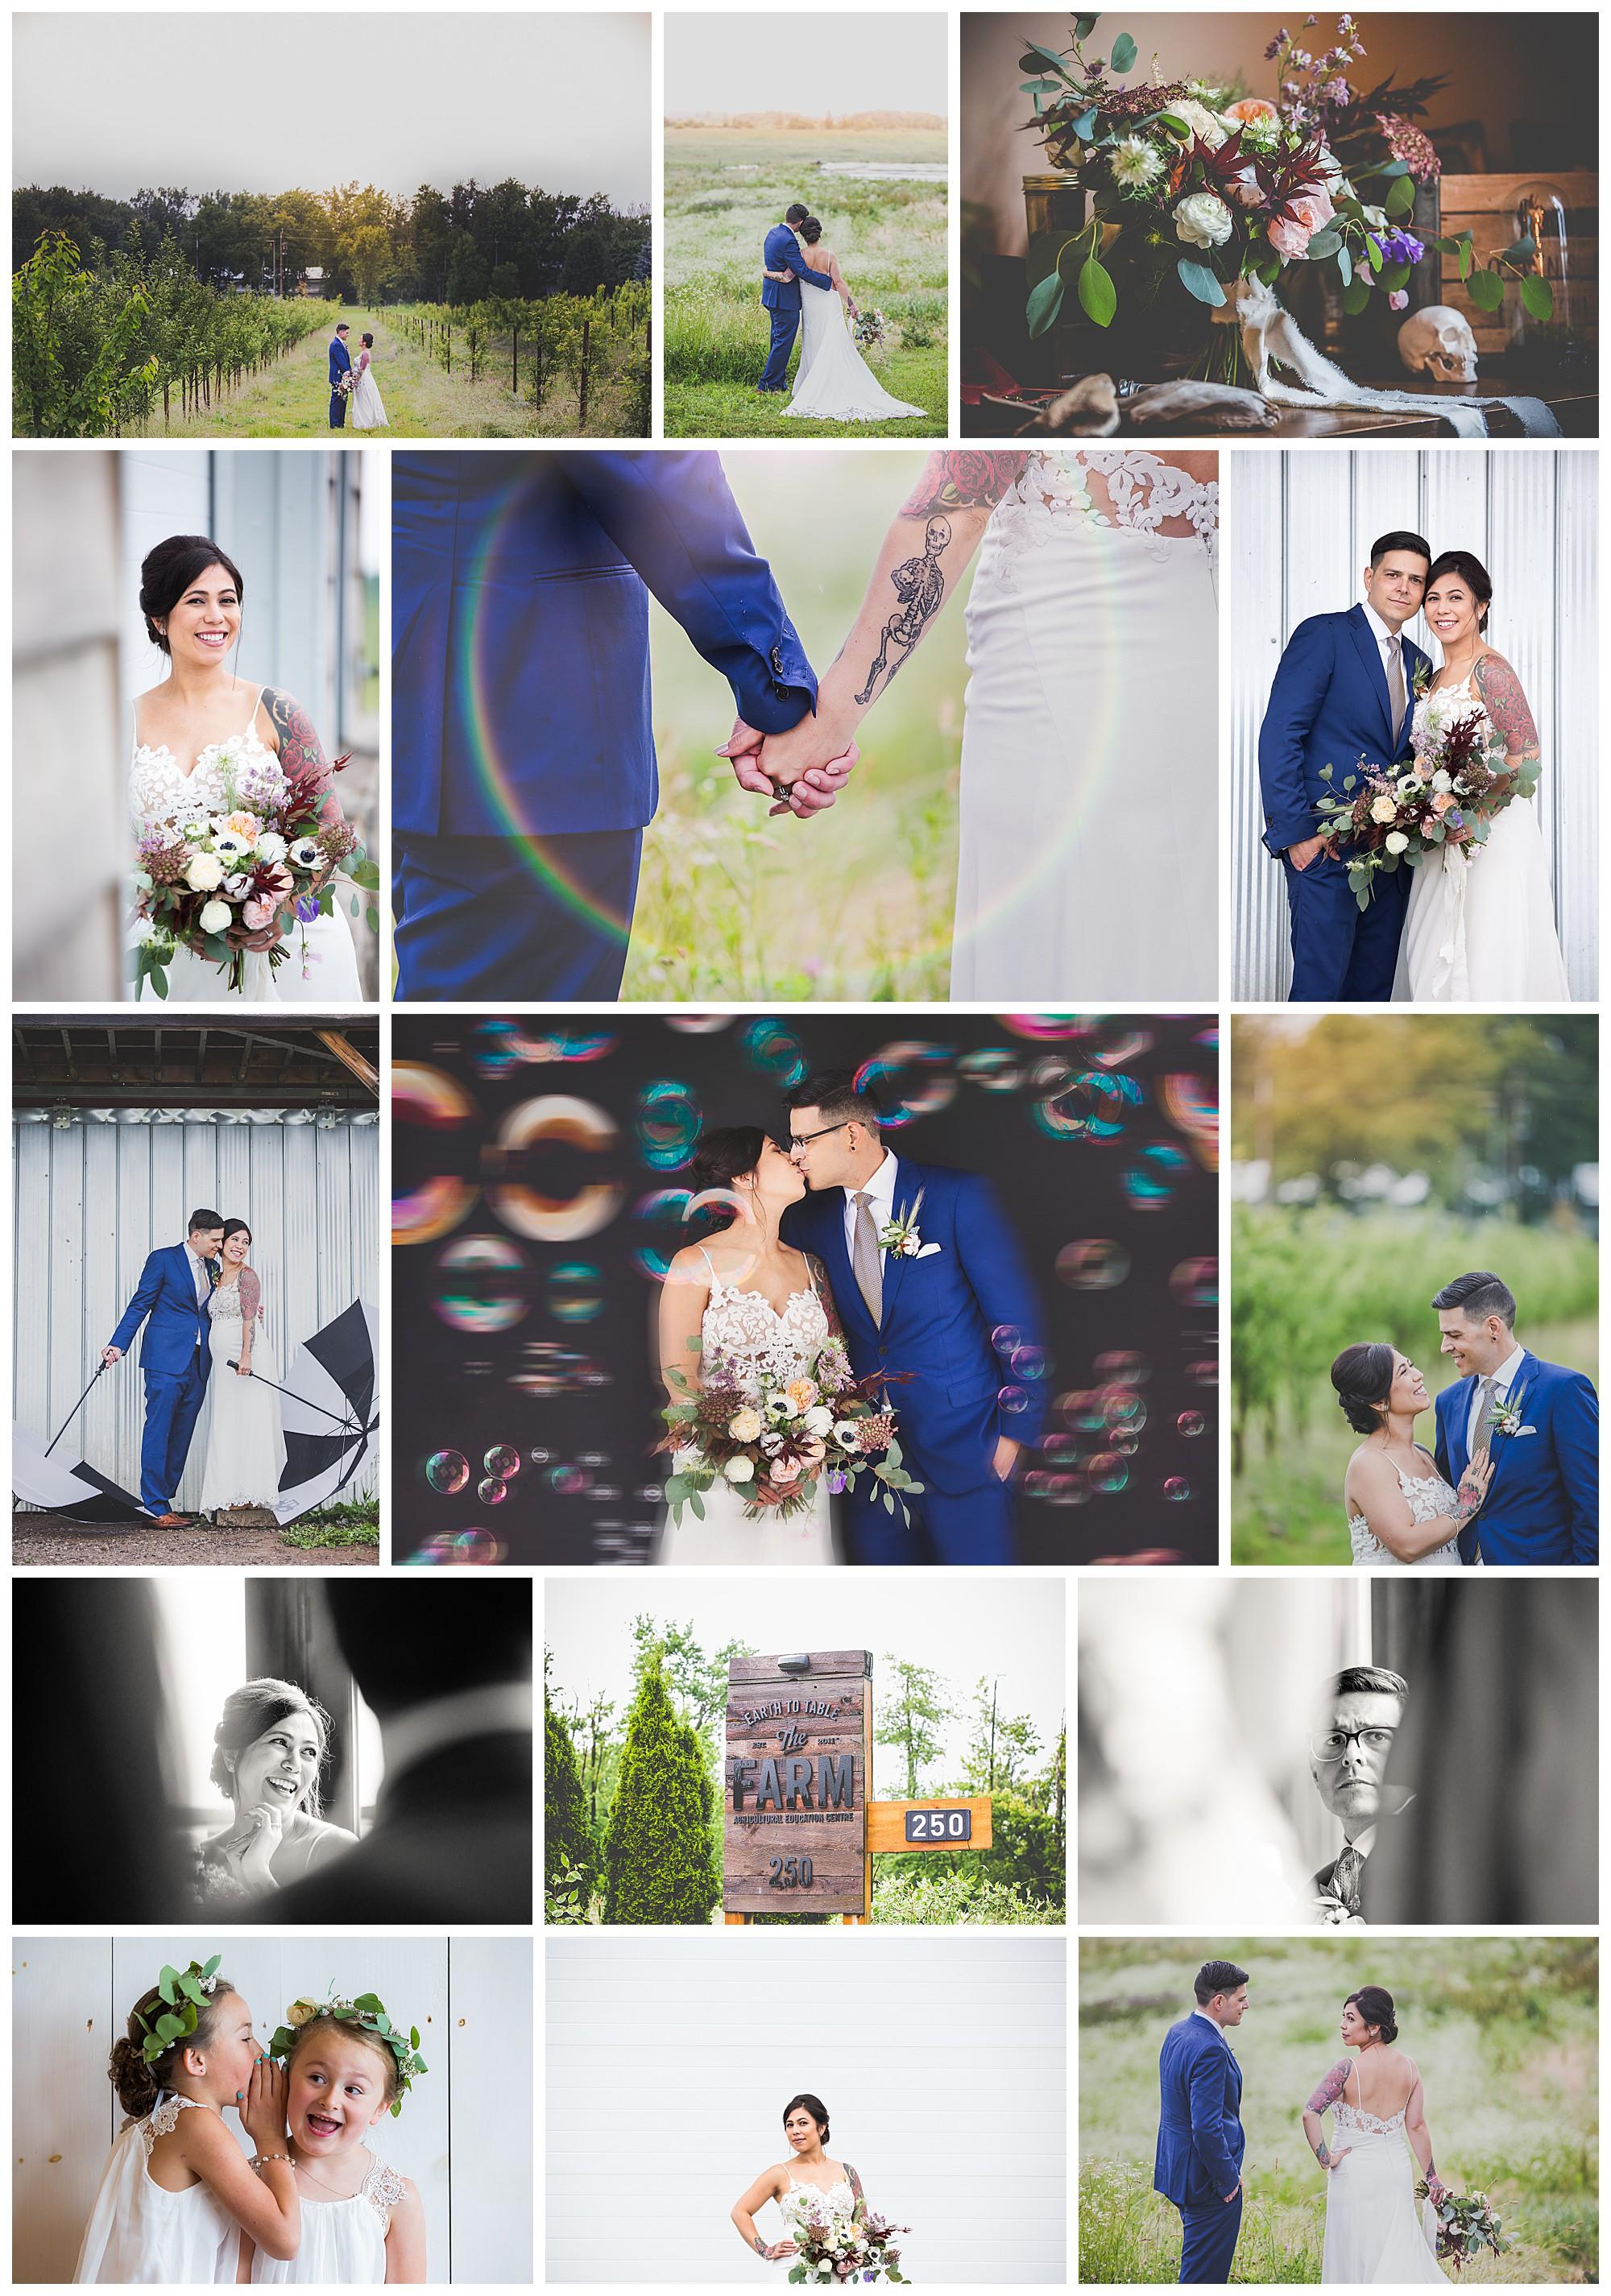 Earth to Table – The Farm, Burlington, Ontario wedding photos by VanDaele & Russell